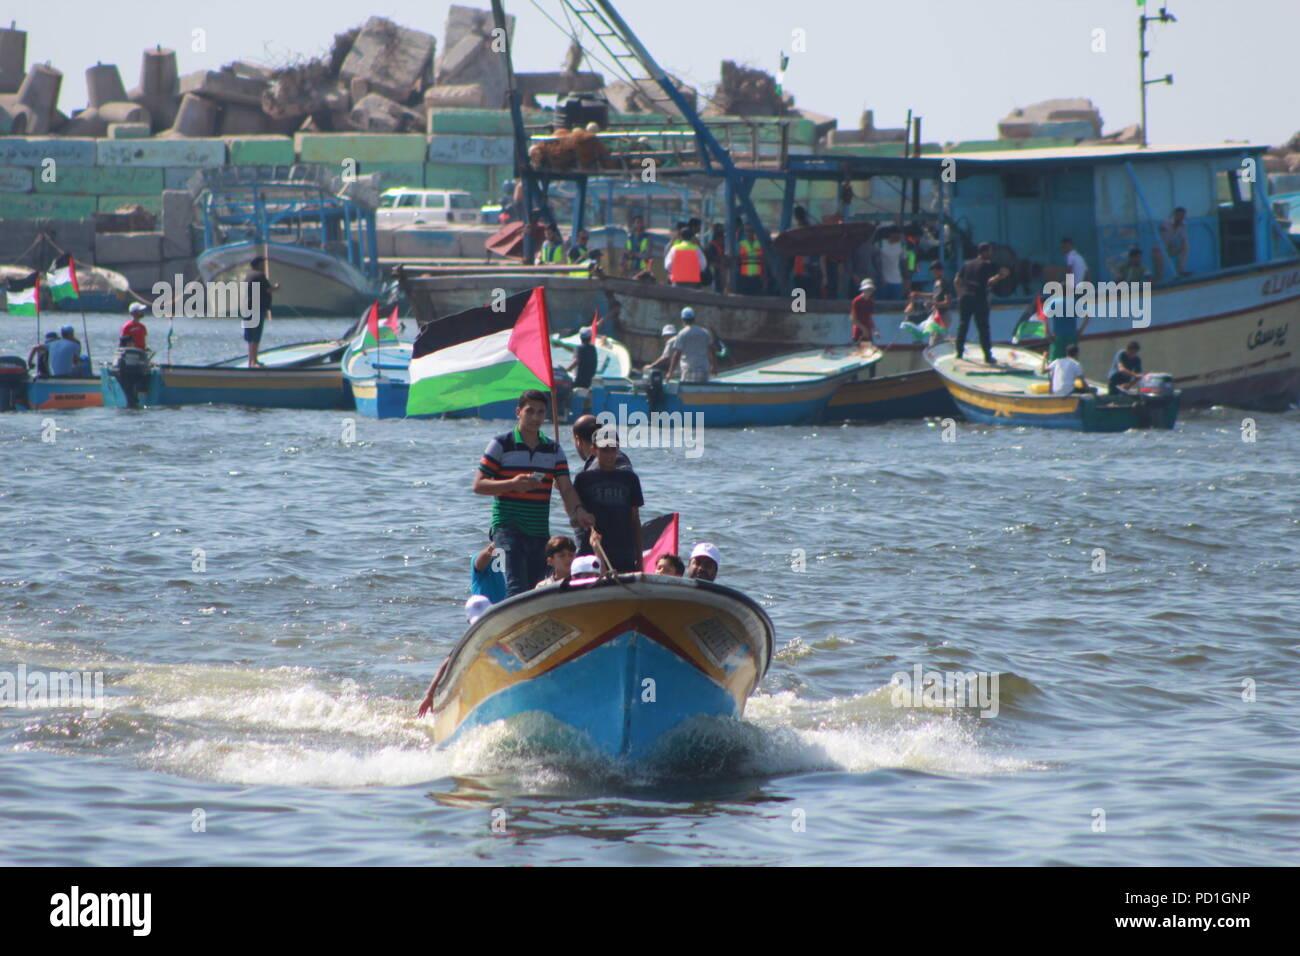 Gaza City, The Gaza Strip, Palestine. 5th Aug, 2018. Boat carrying ...